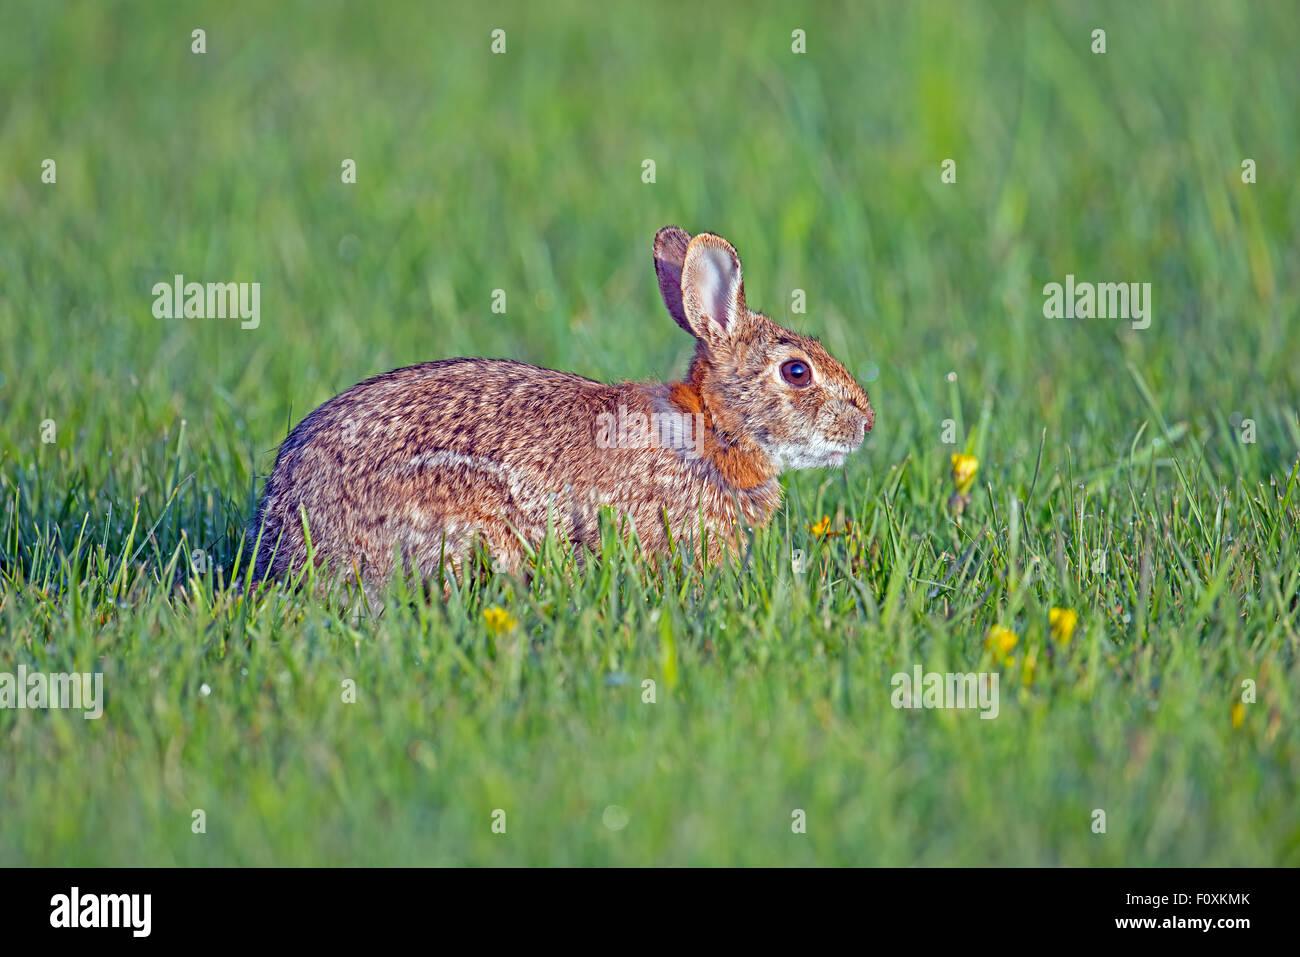 Cottontail Rabbit - Stock Image